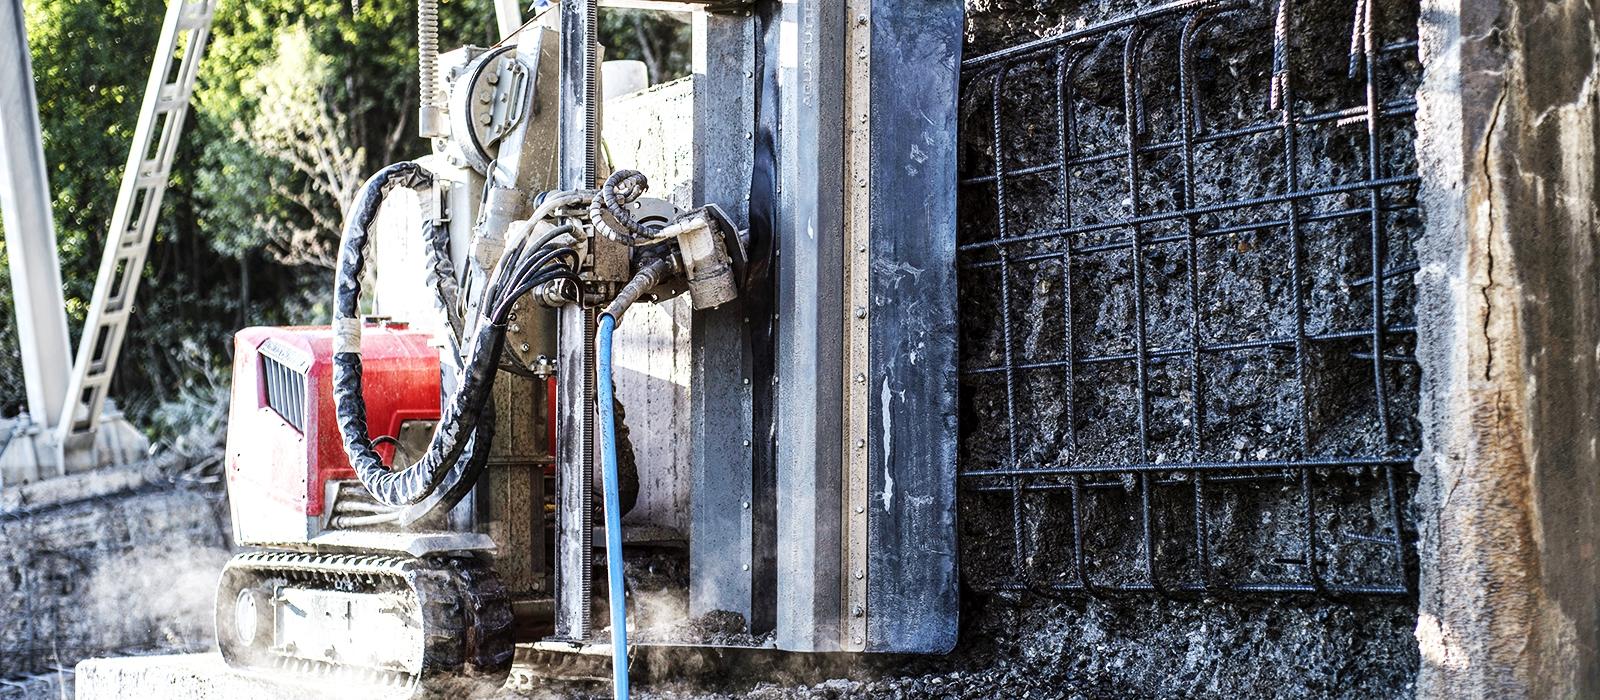 Hydrodemolition methods aquajet systems aqua cutter